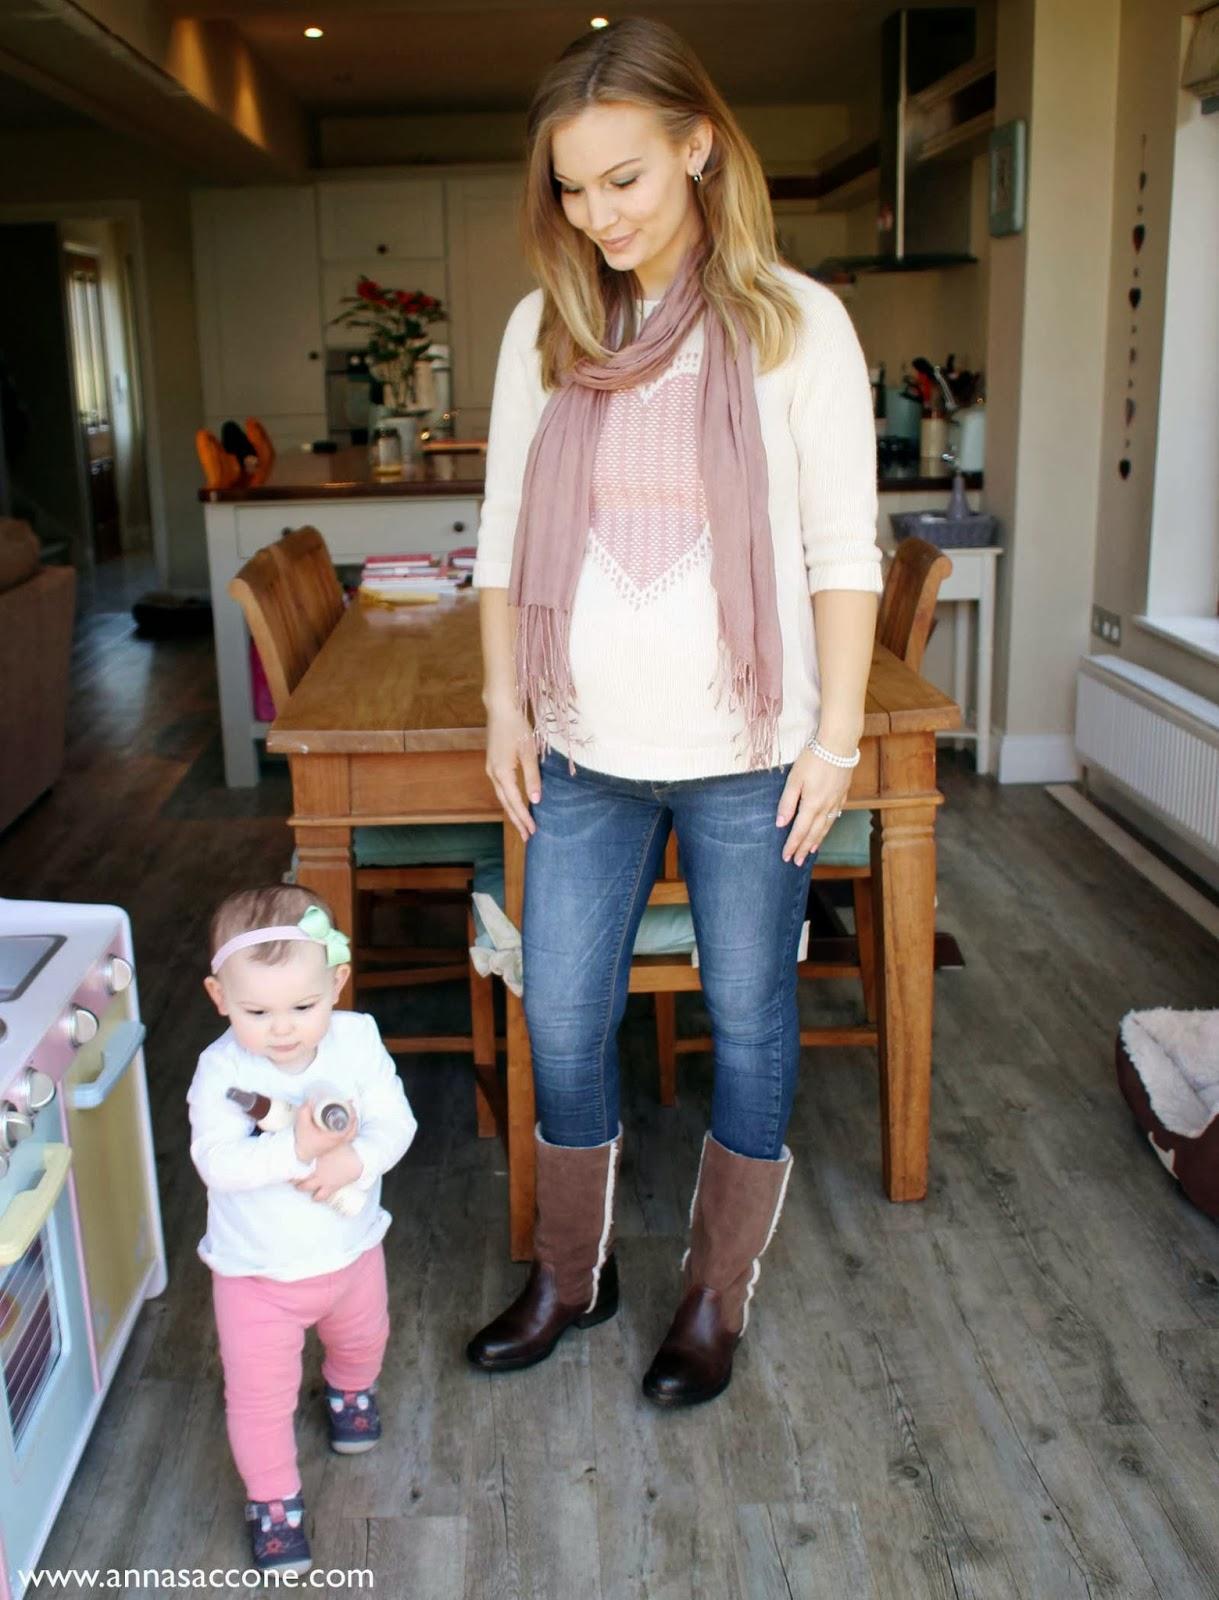 Anna Saccone Joly Age, Bio, Height, Wiki, Husband, Net Worth